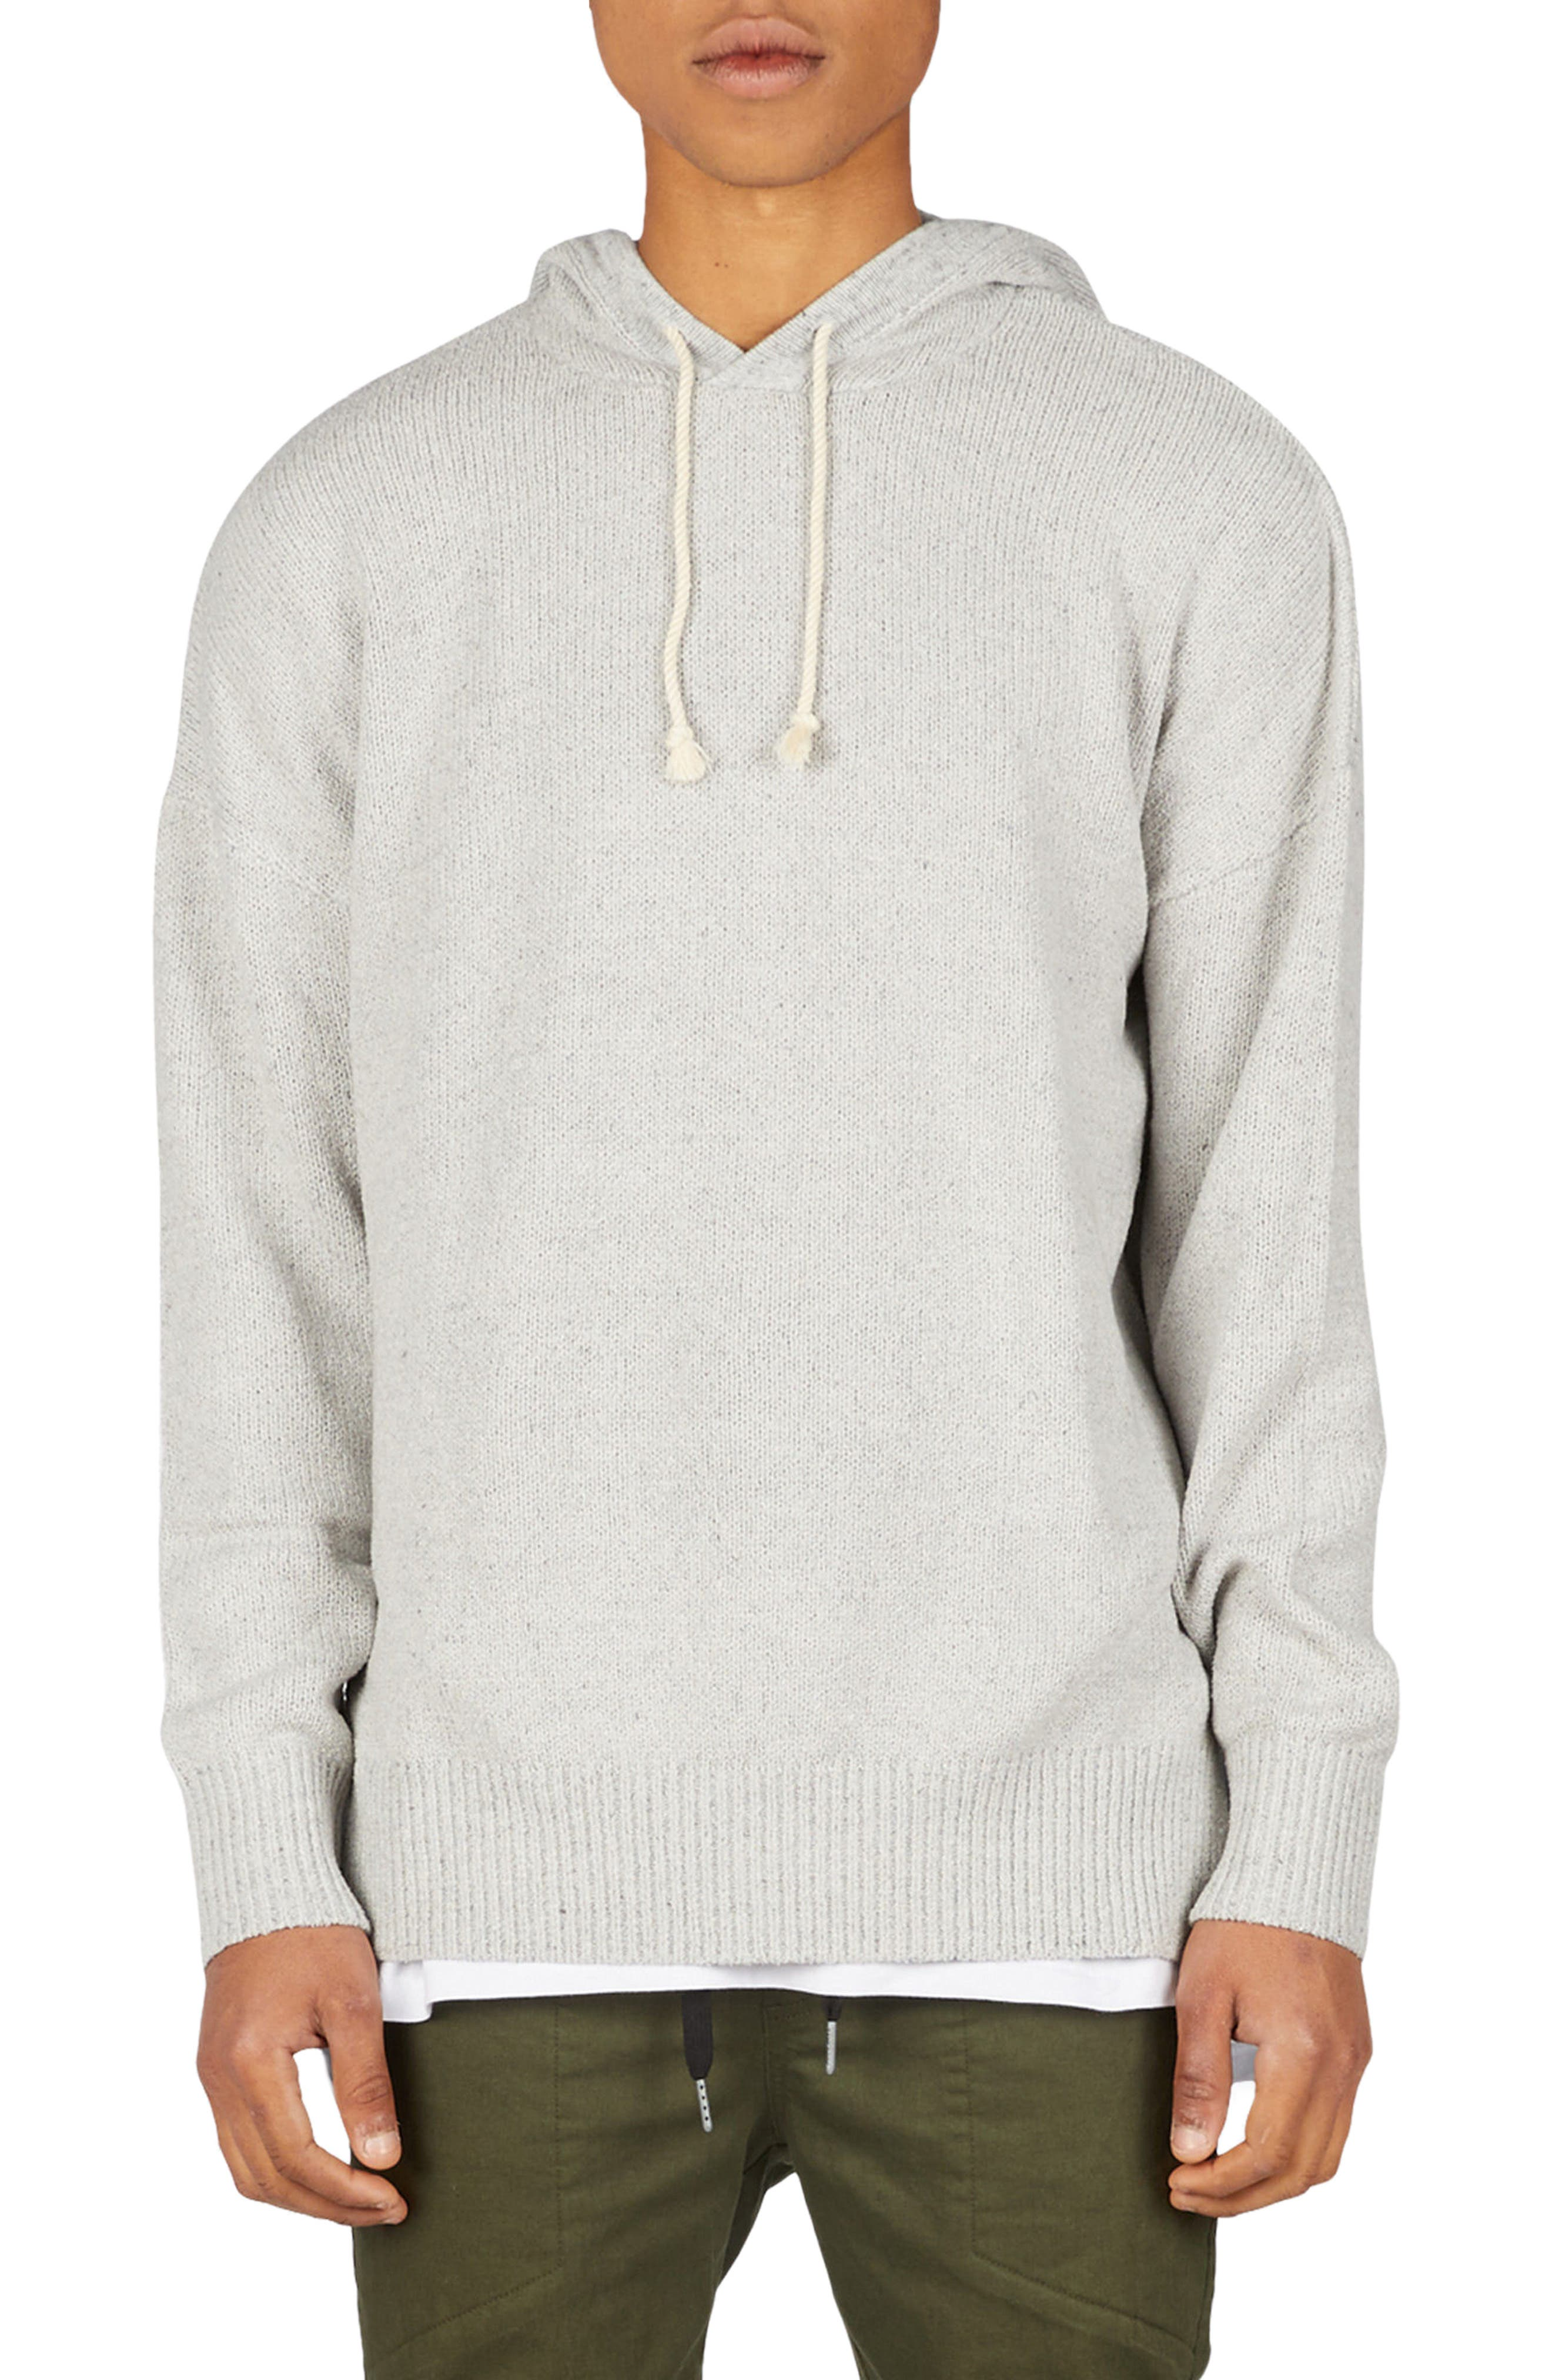 Towel Knit Hooded Sweatshirt,                         Main,                         color, Grey